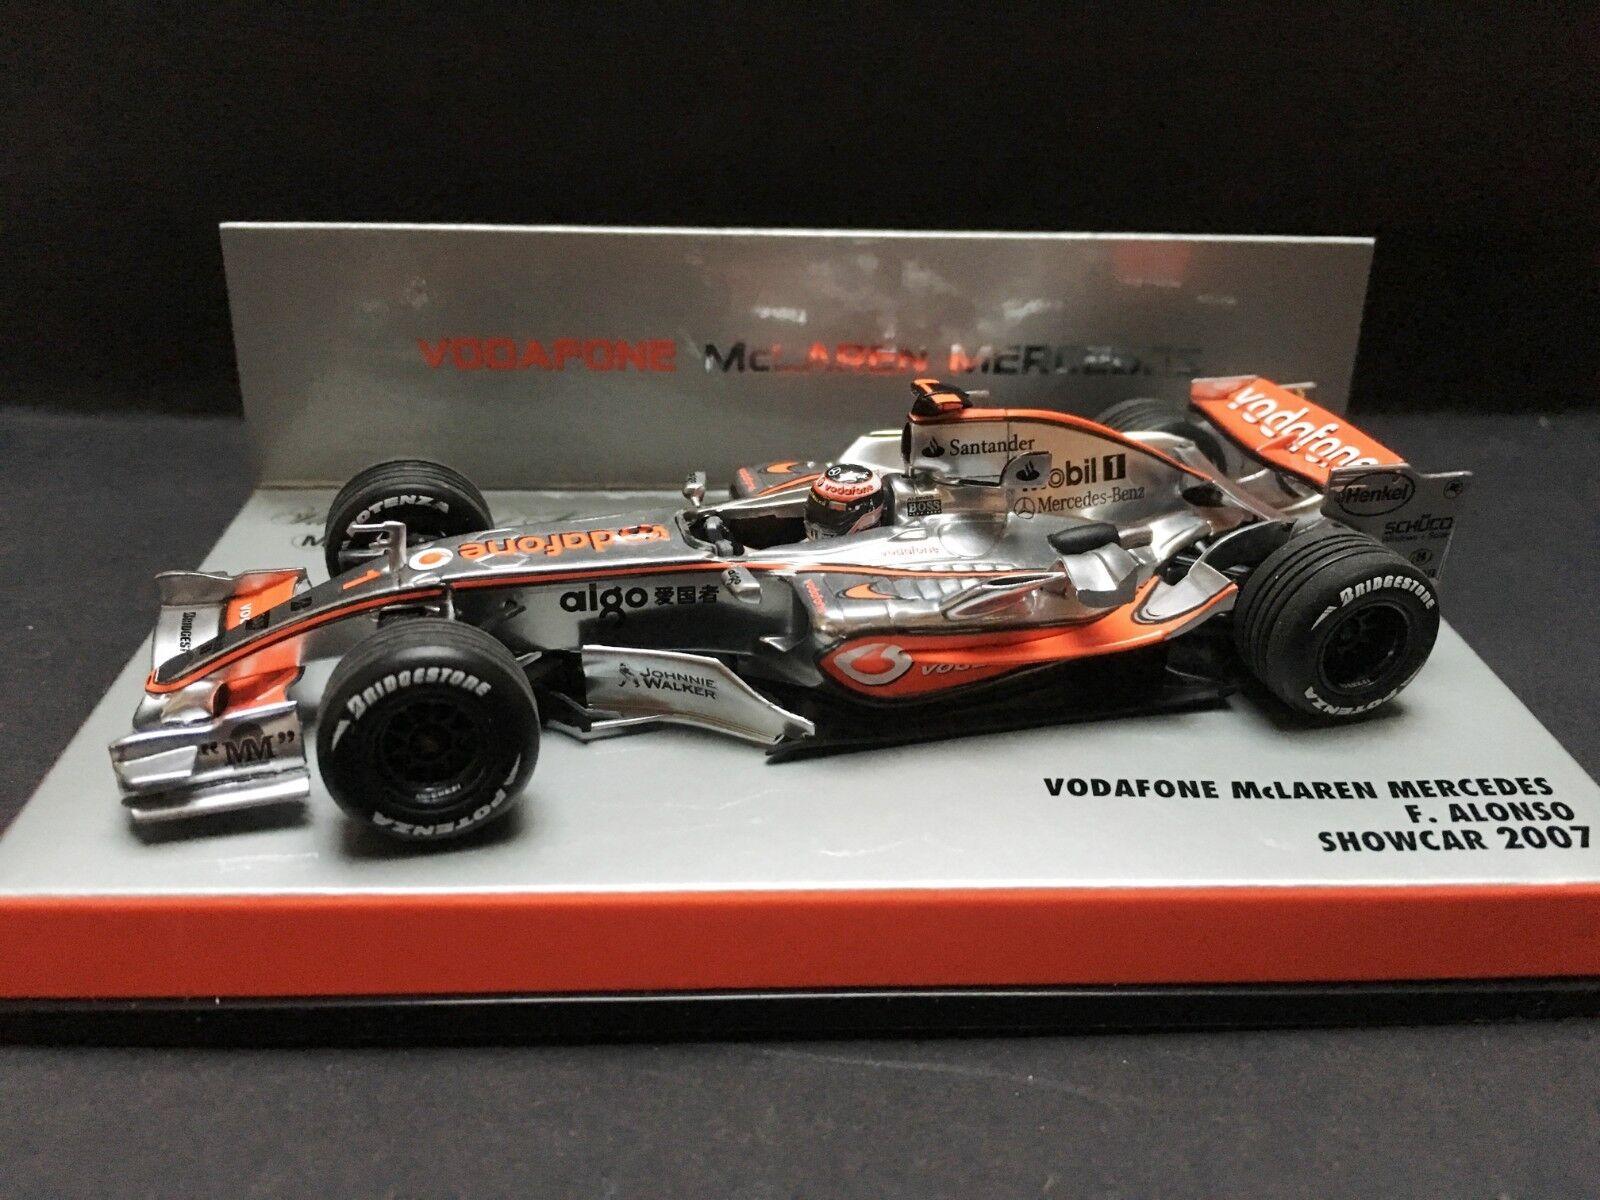 Minichamps - Fernando Alonso - McLaren - MP4 22 - 2007 - 1 43 - Showcar